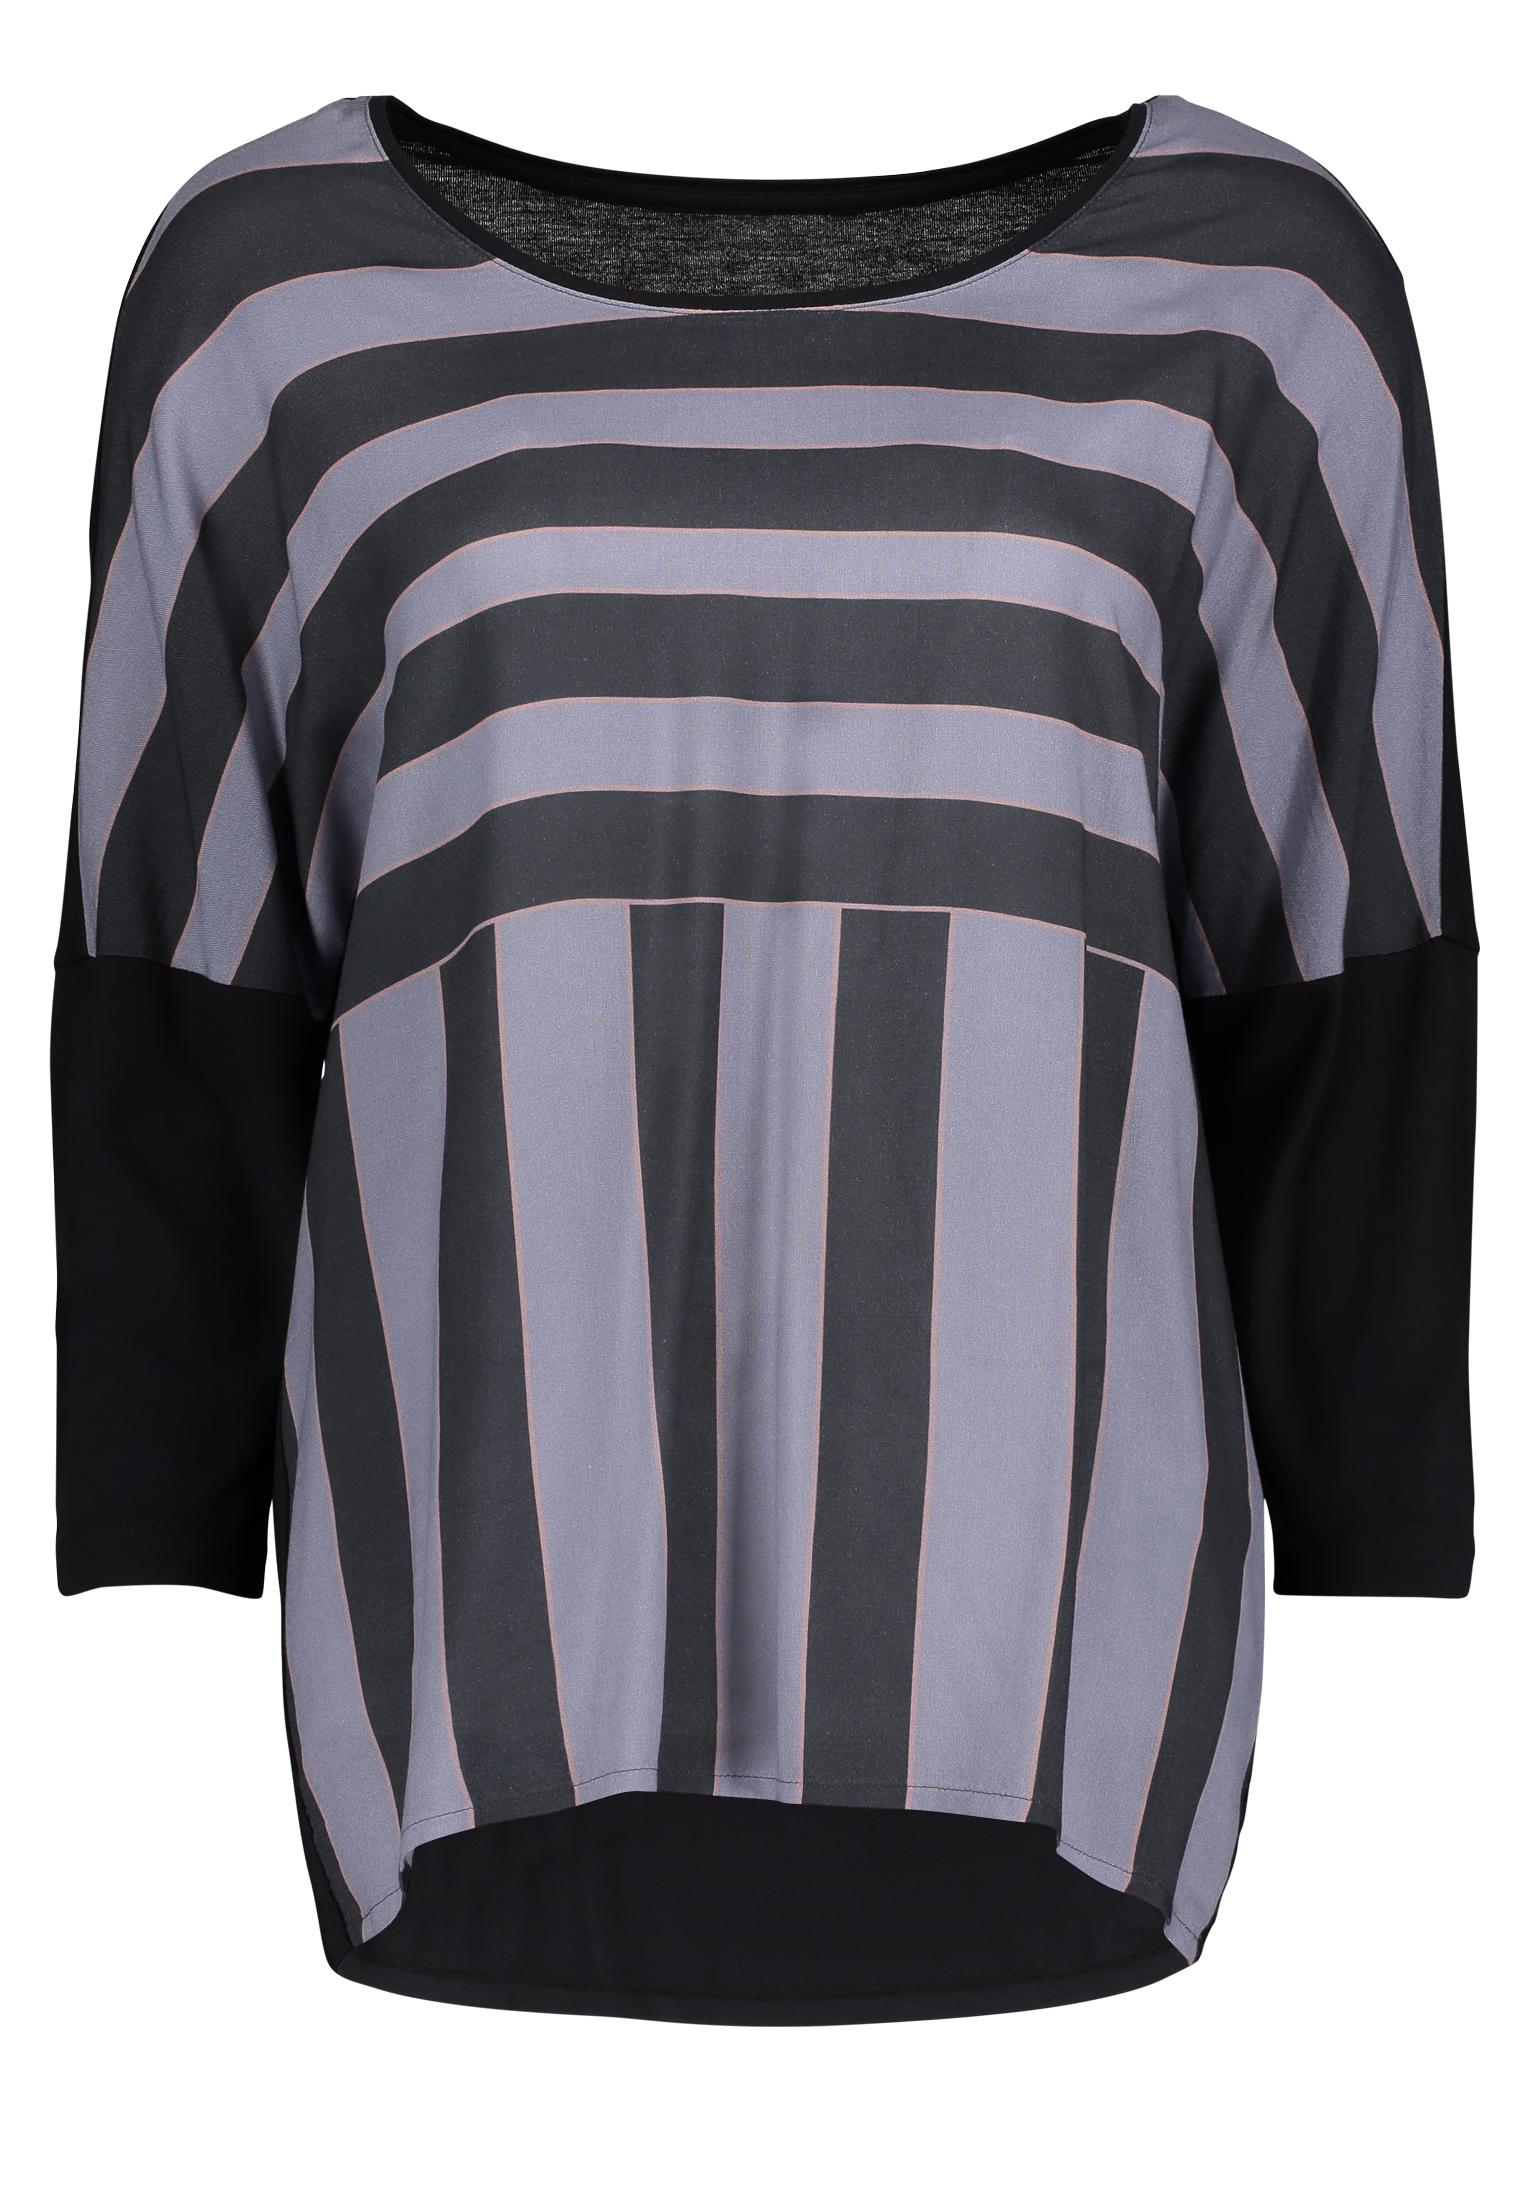 Shirt Maßtab